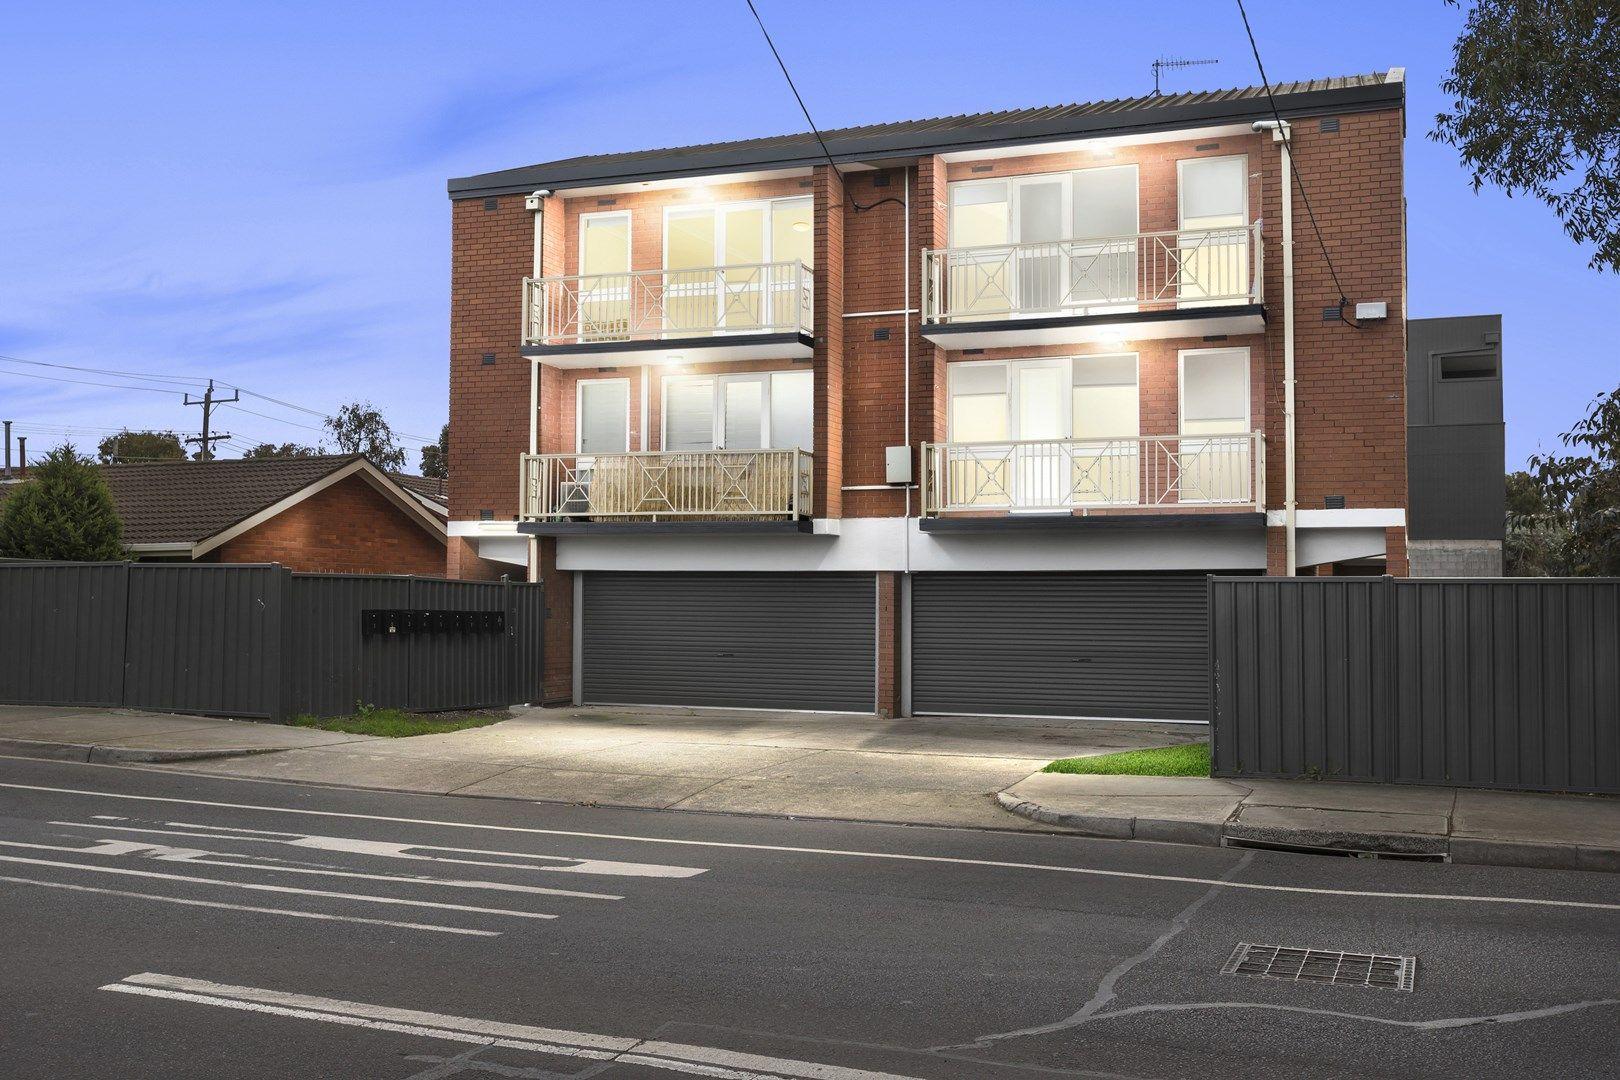 5/44 Munro Street, Coburg VIC 3058, Image 1